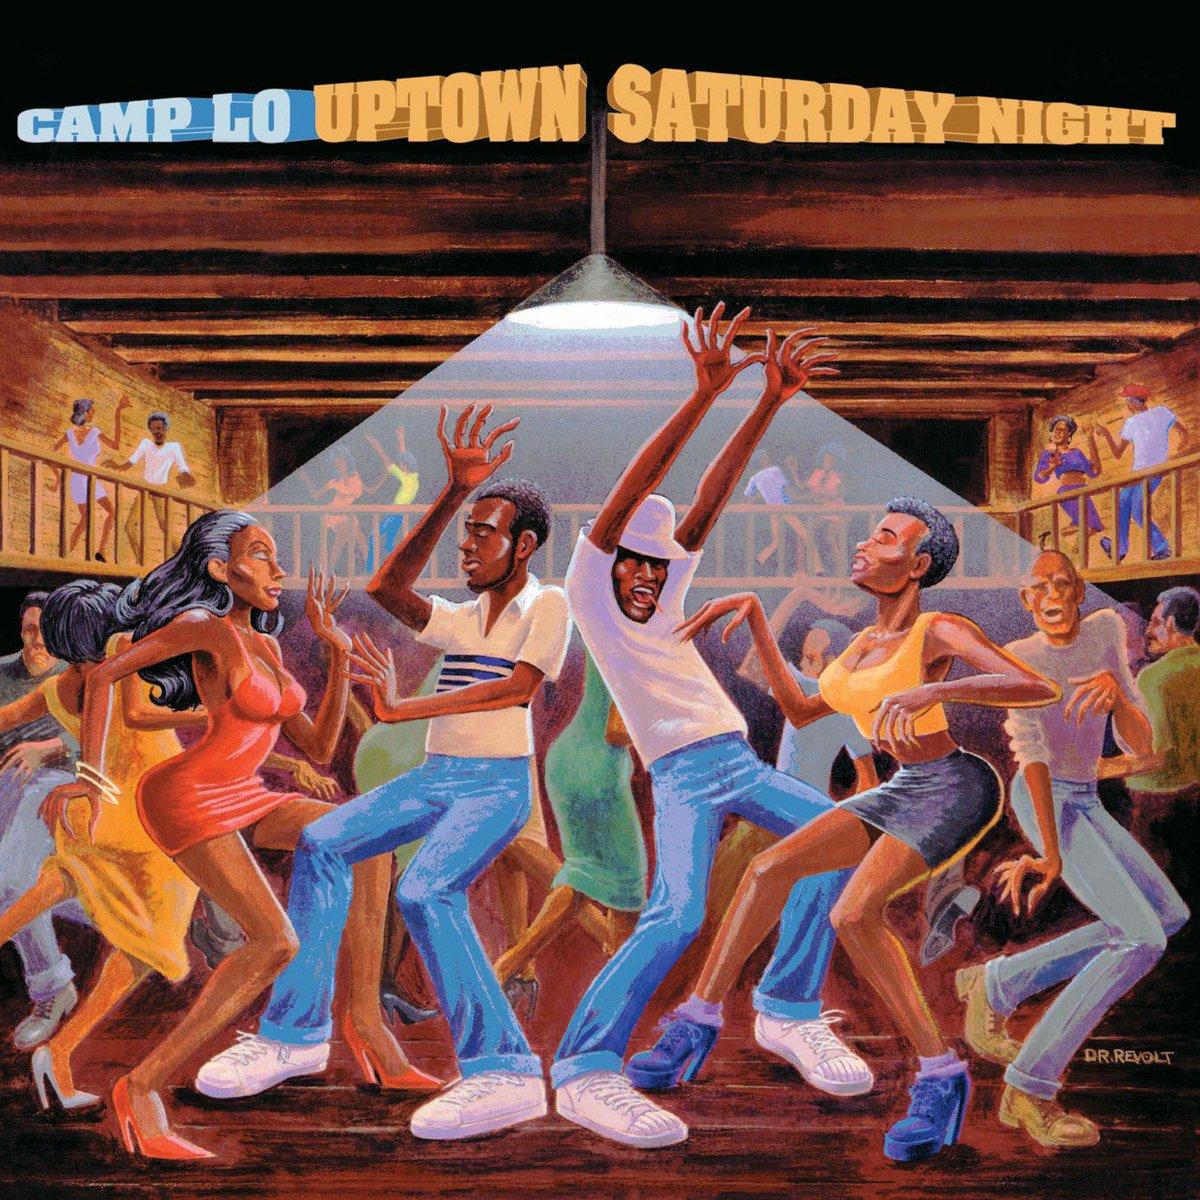 camp-lo-uptown-saturday-night.jpg